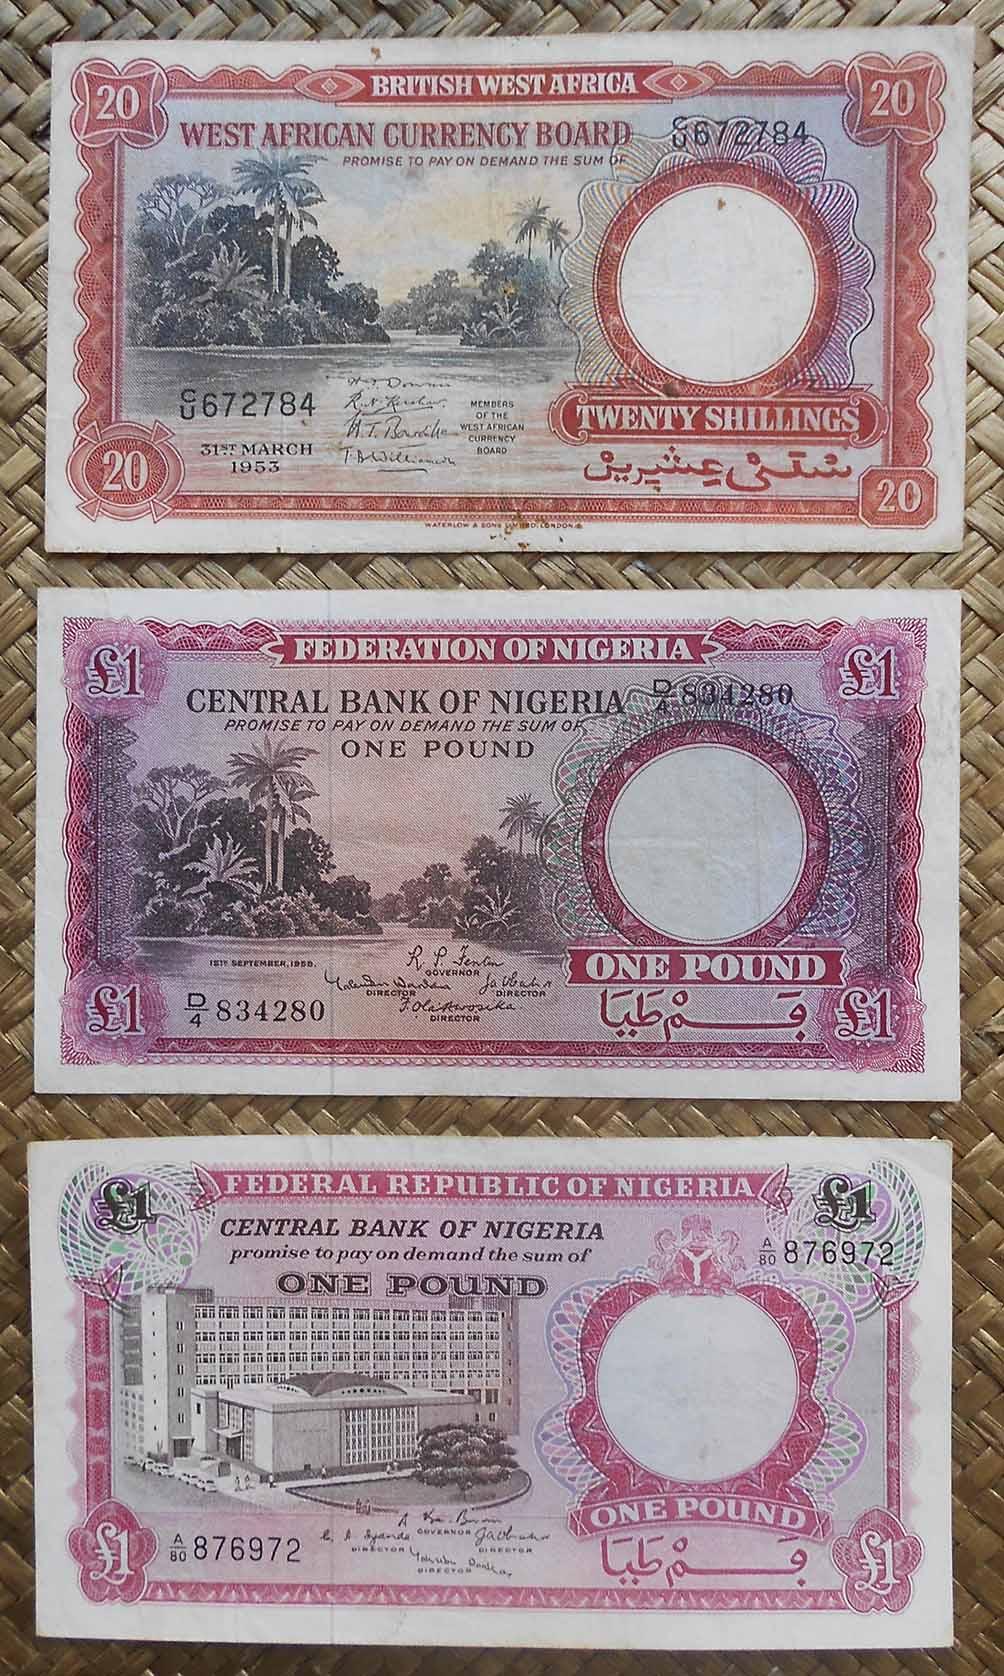 British West Africa vs. Nigeria 20 shilling 1953 vs. 1 pound 1958 vs. 1967 anversos